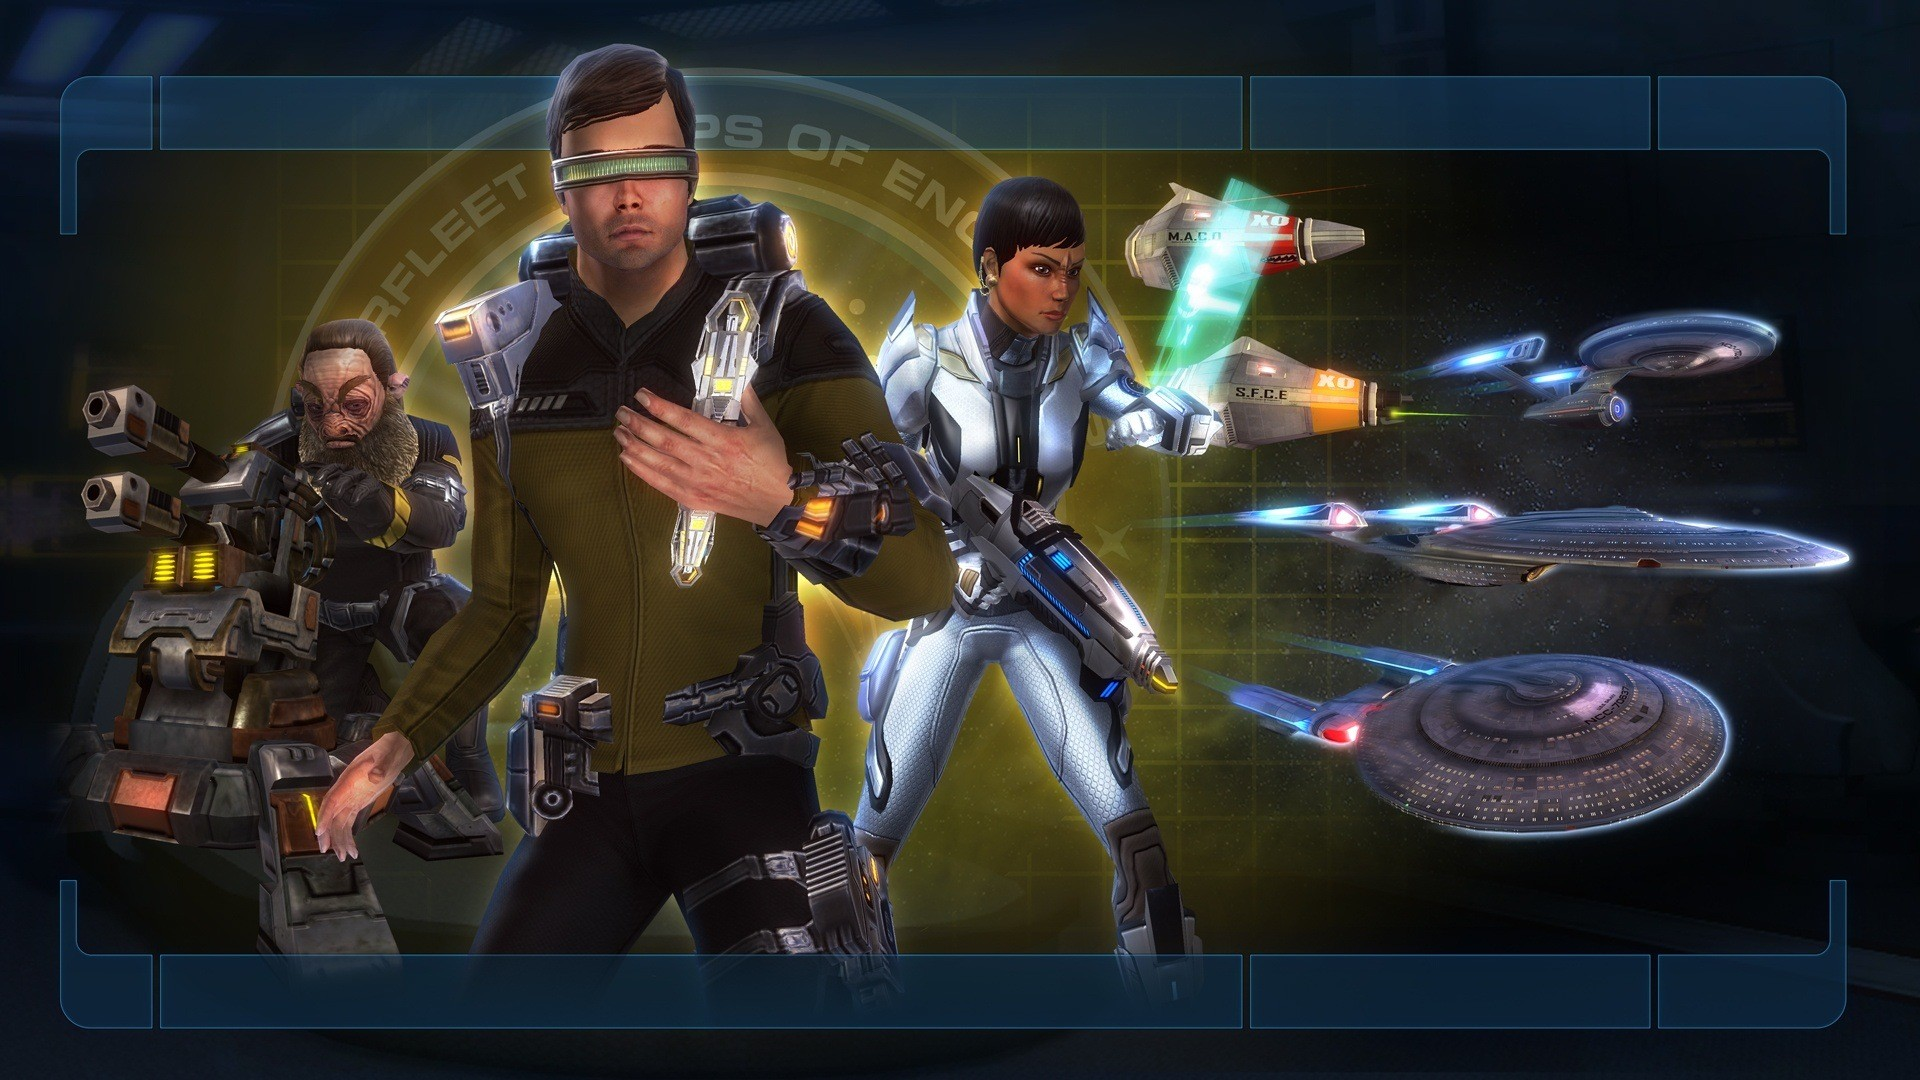 Dual Screen Star Trek Online Wallpaper